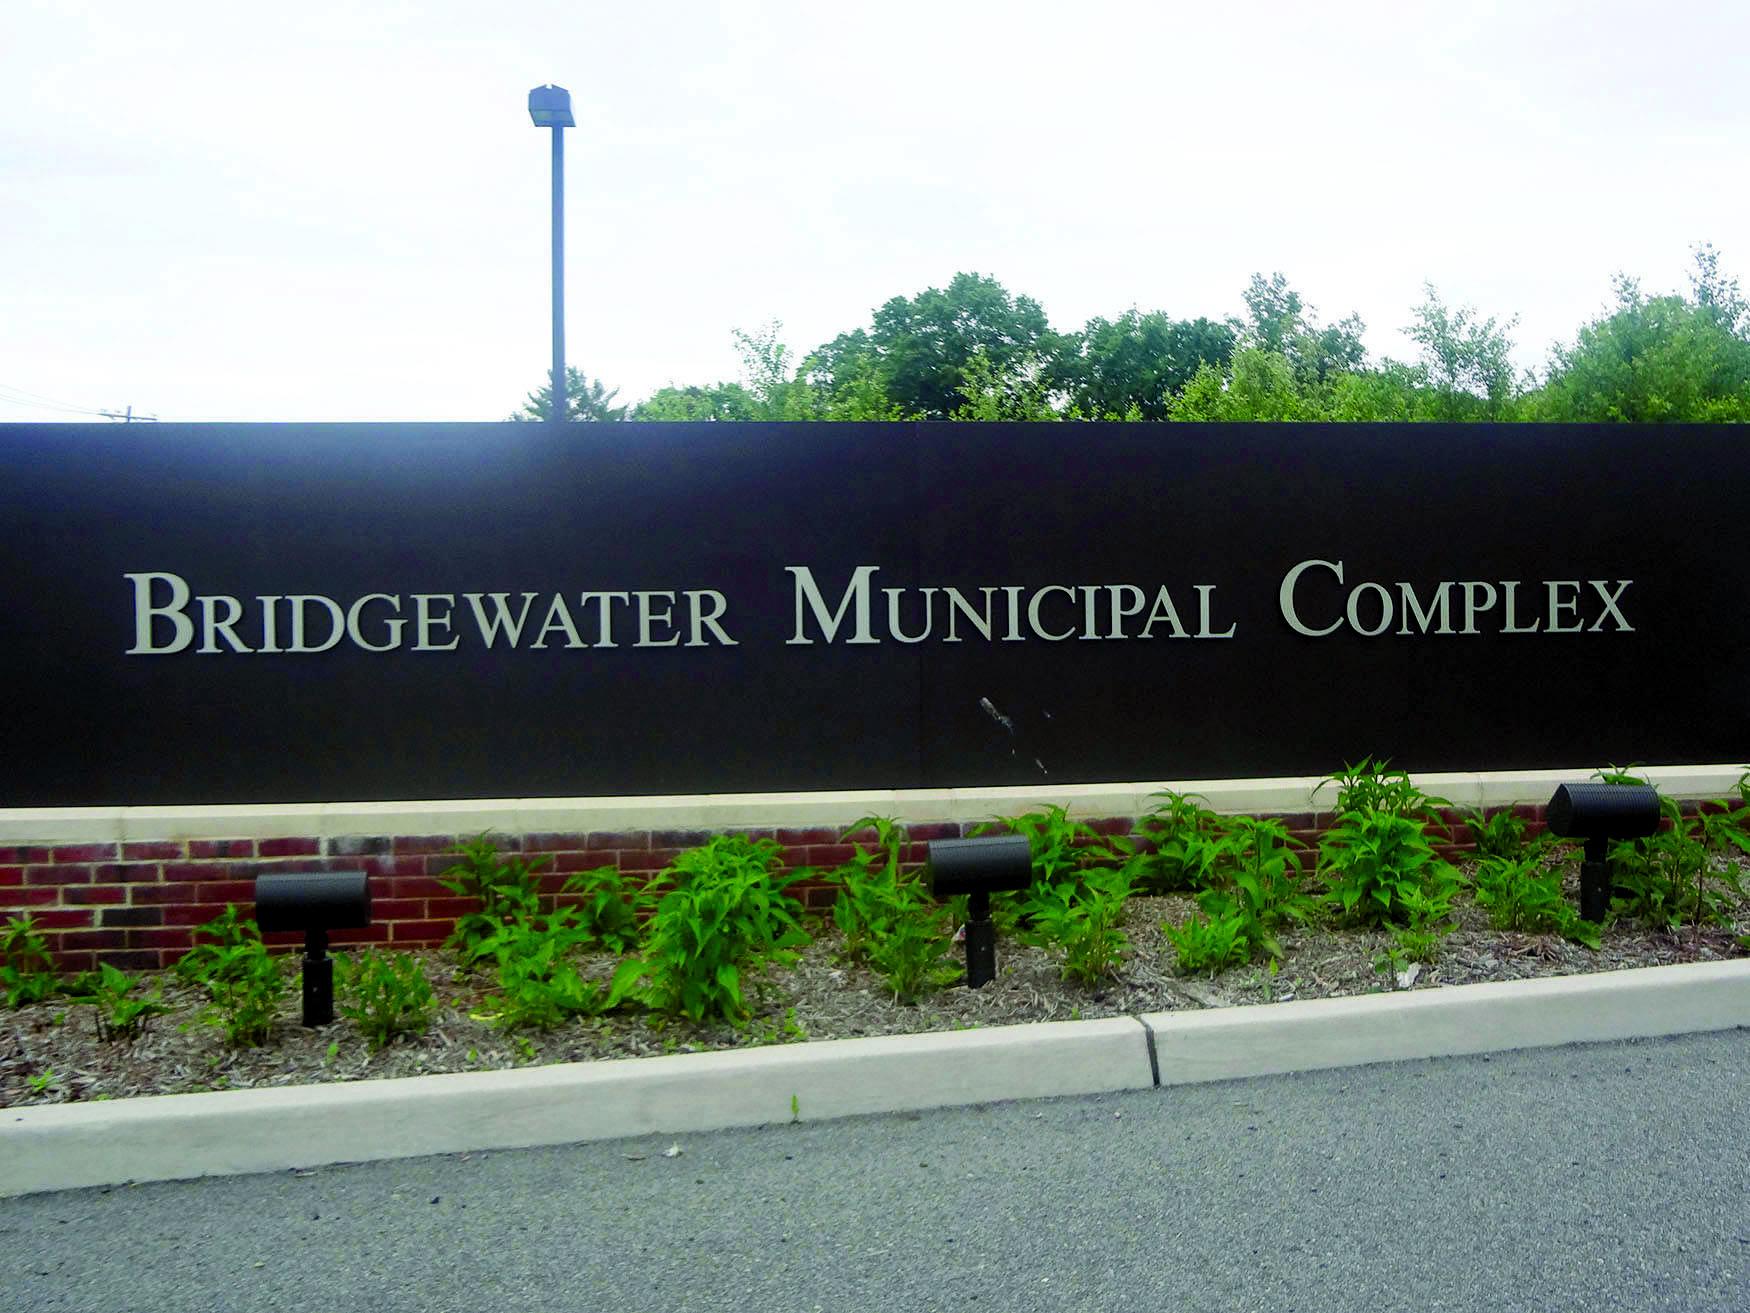 74d6d0120094ad902ea4_Bridgewater_municipal.jpg